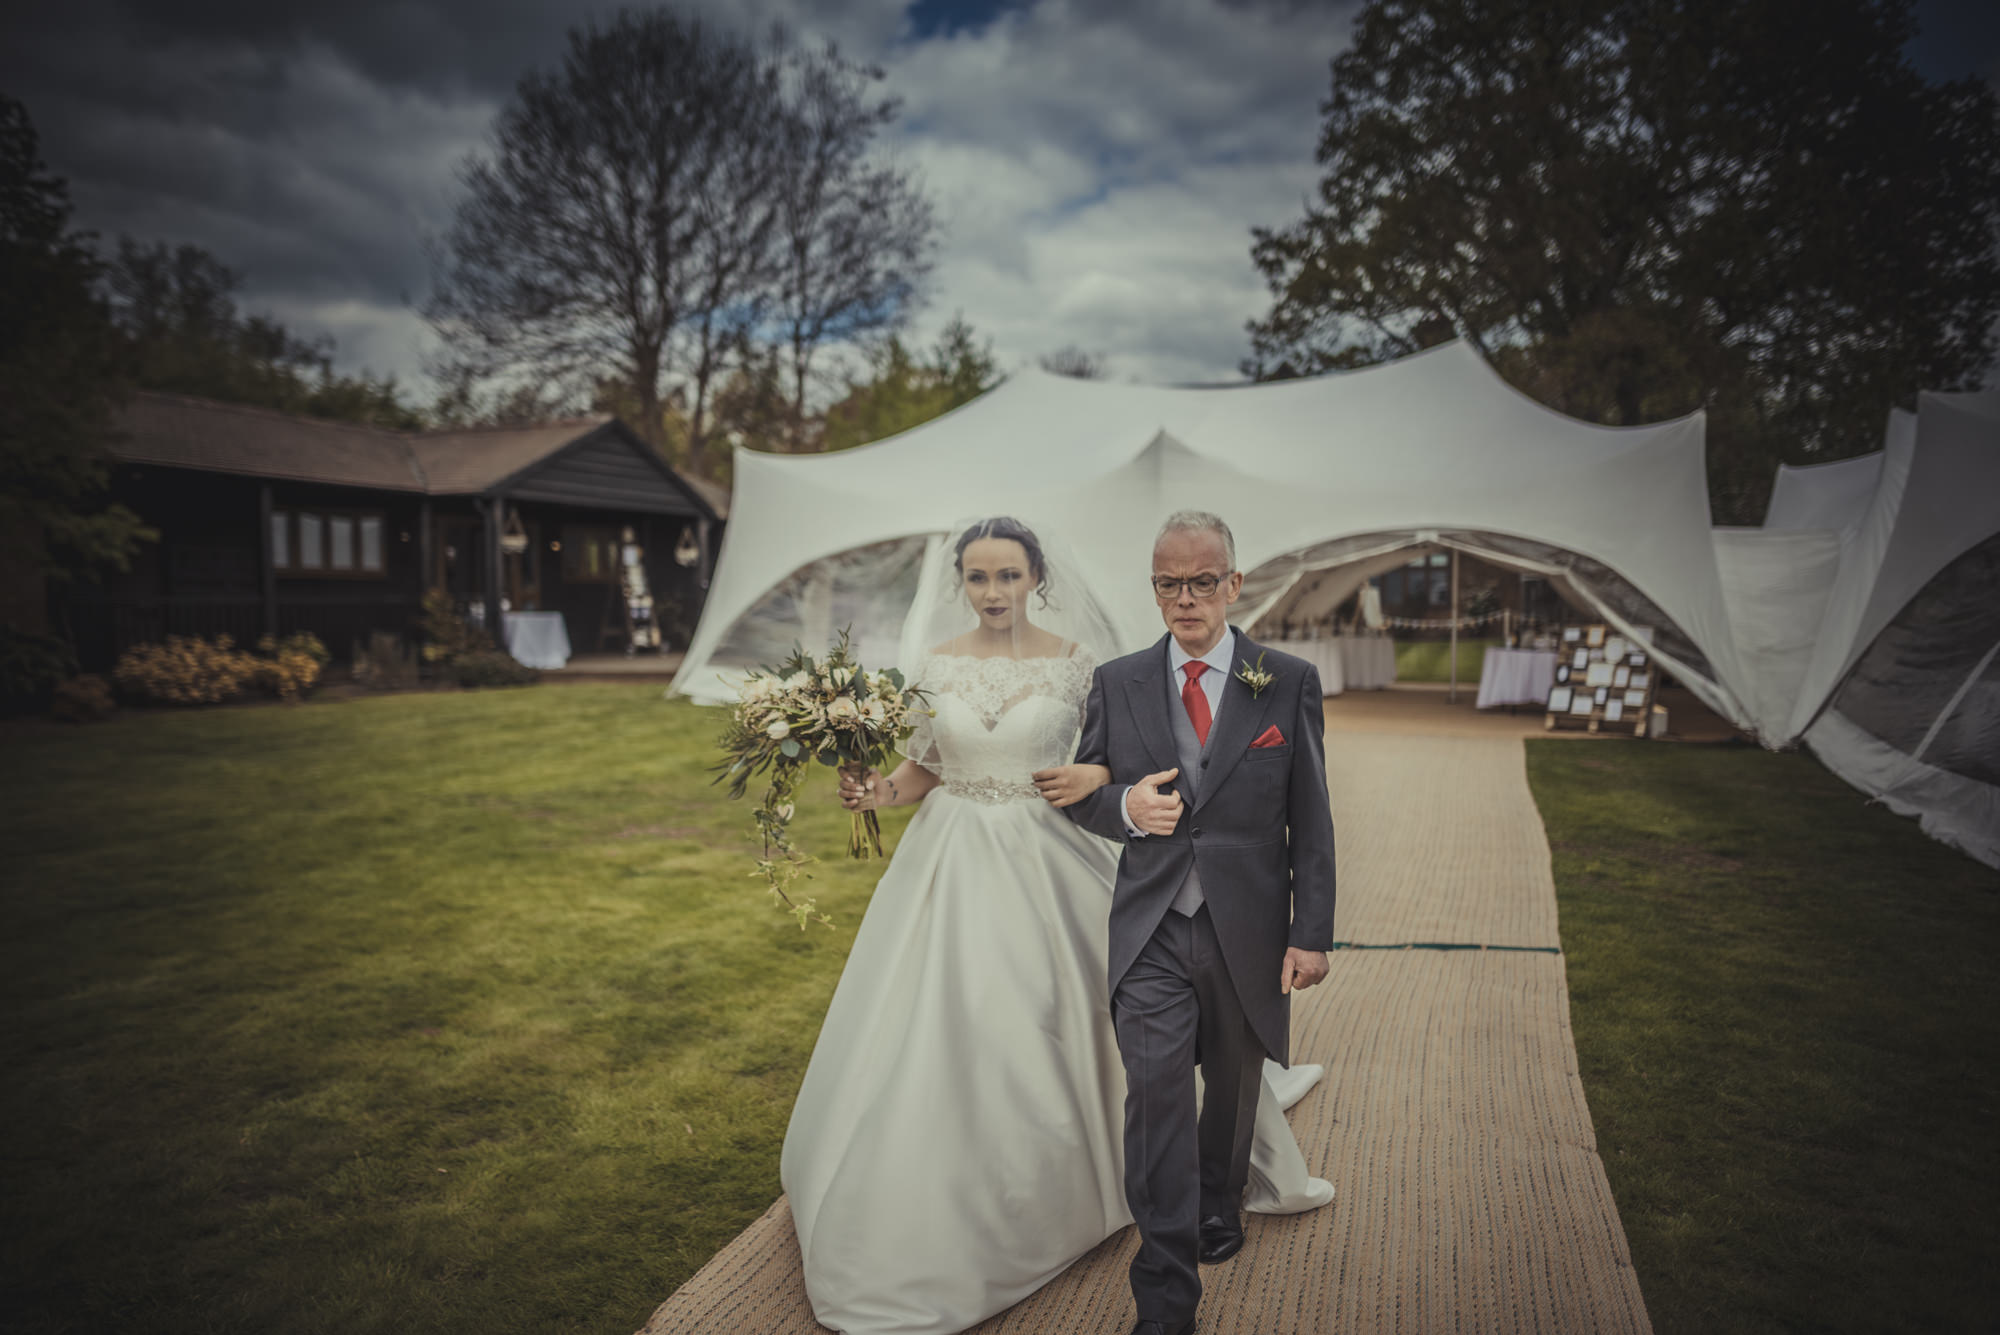 Jacqueline-Gareth-Wedding-Westmead-Events-Surrey-Manu-Mendoza-Wedding-Photography-188.jpg